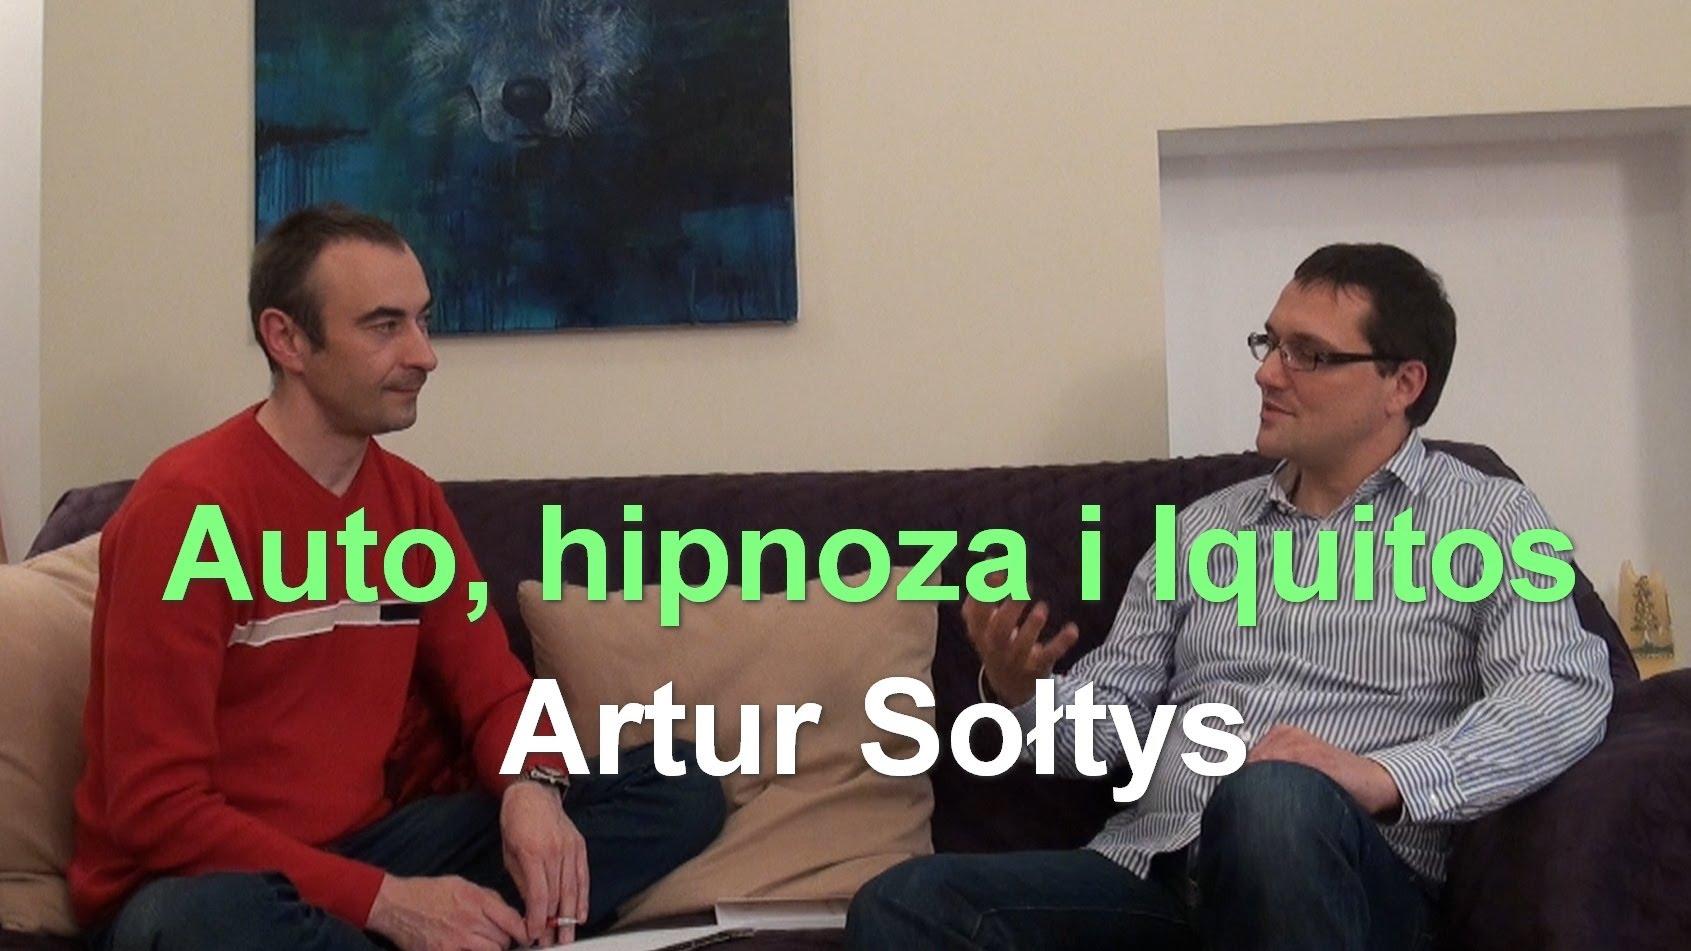 Auto, hipnoza i Iquitos – Artur Sołtys